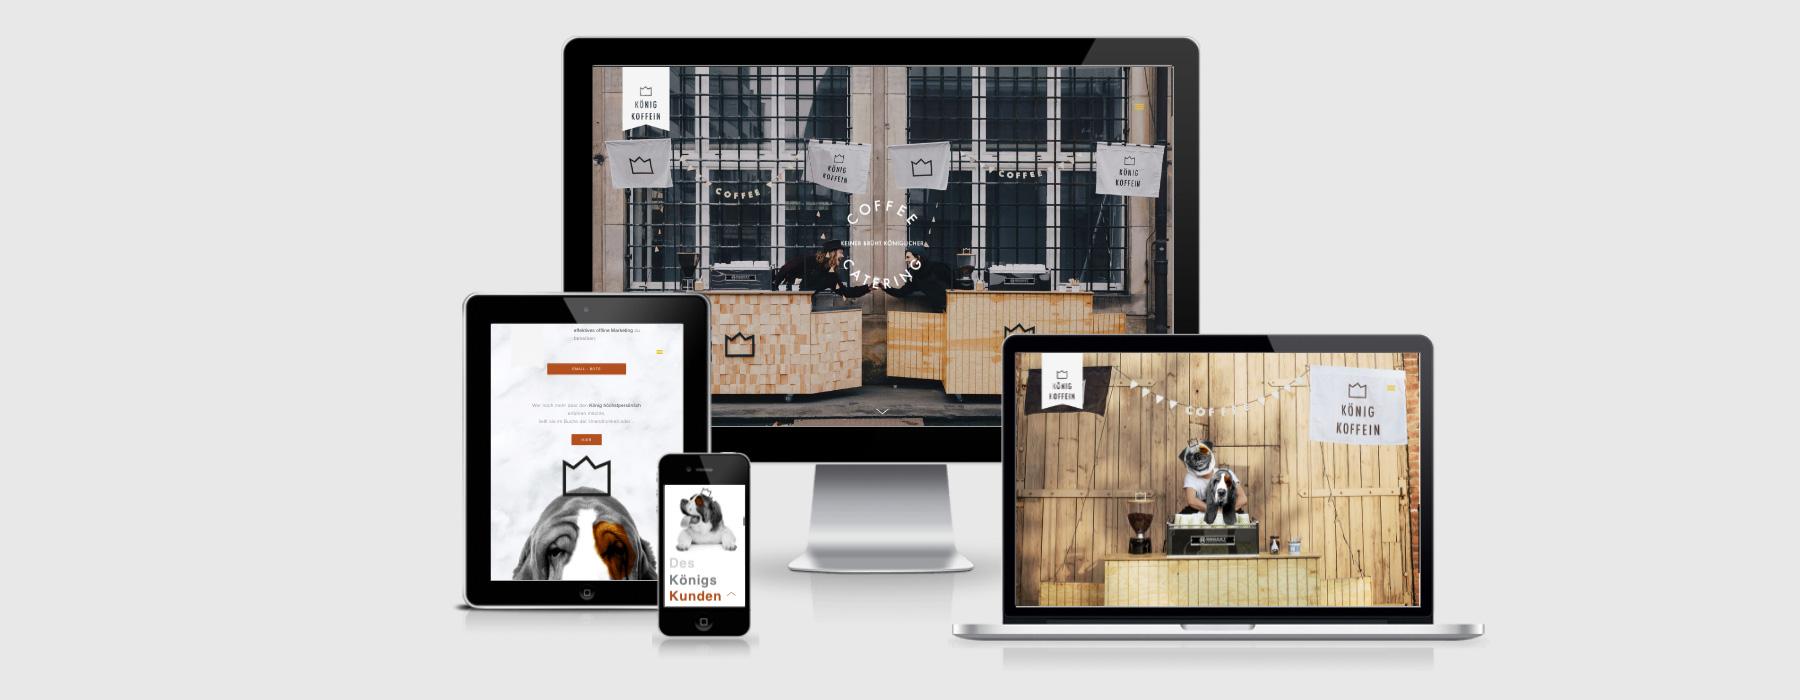 koenig-koffein-brand-corporate-design-identity-homepage-by-max-duchardt